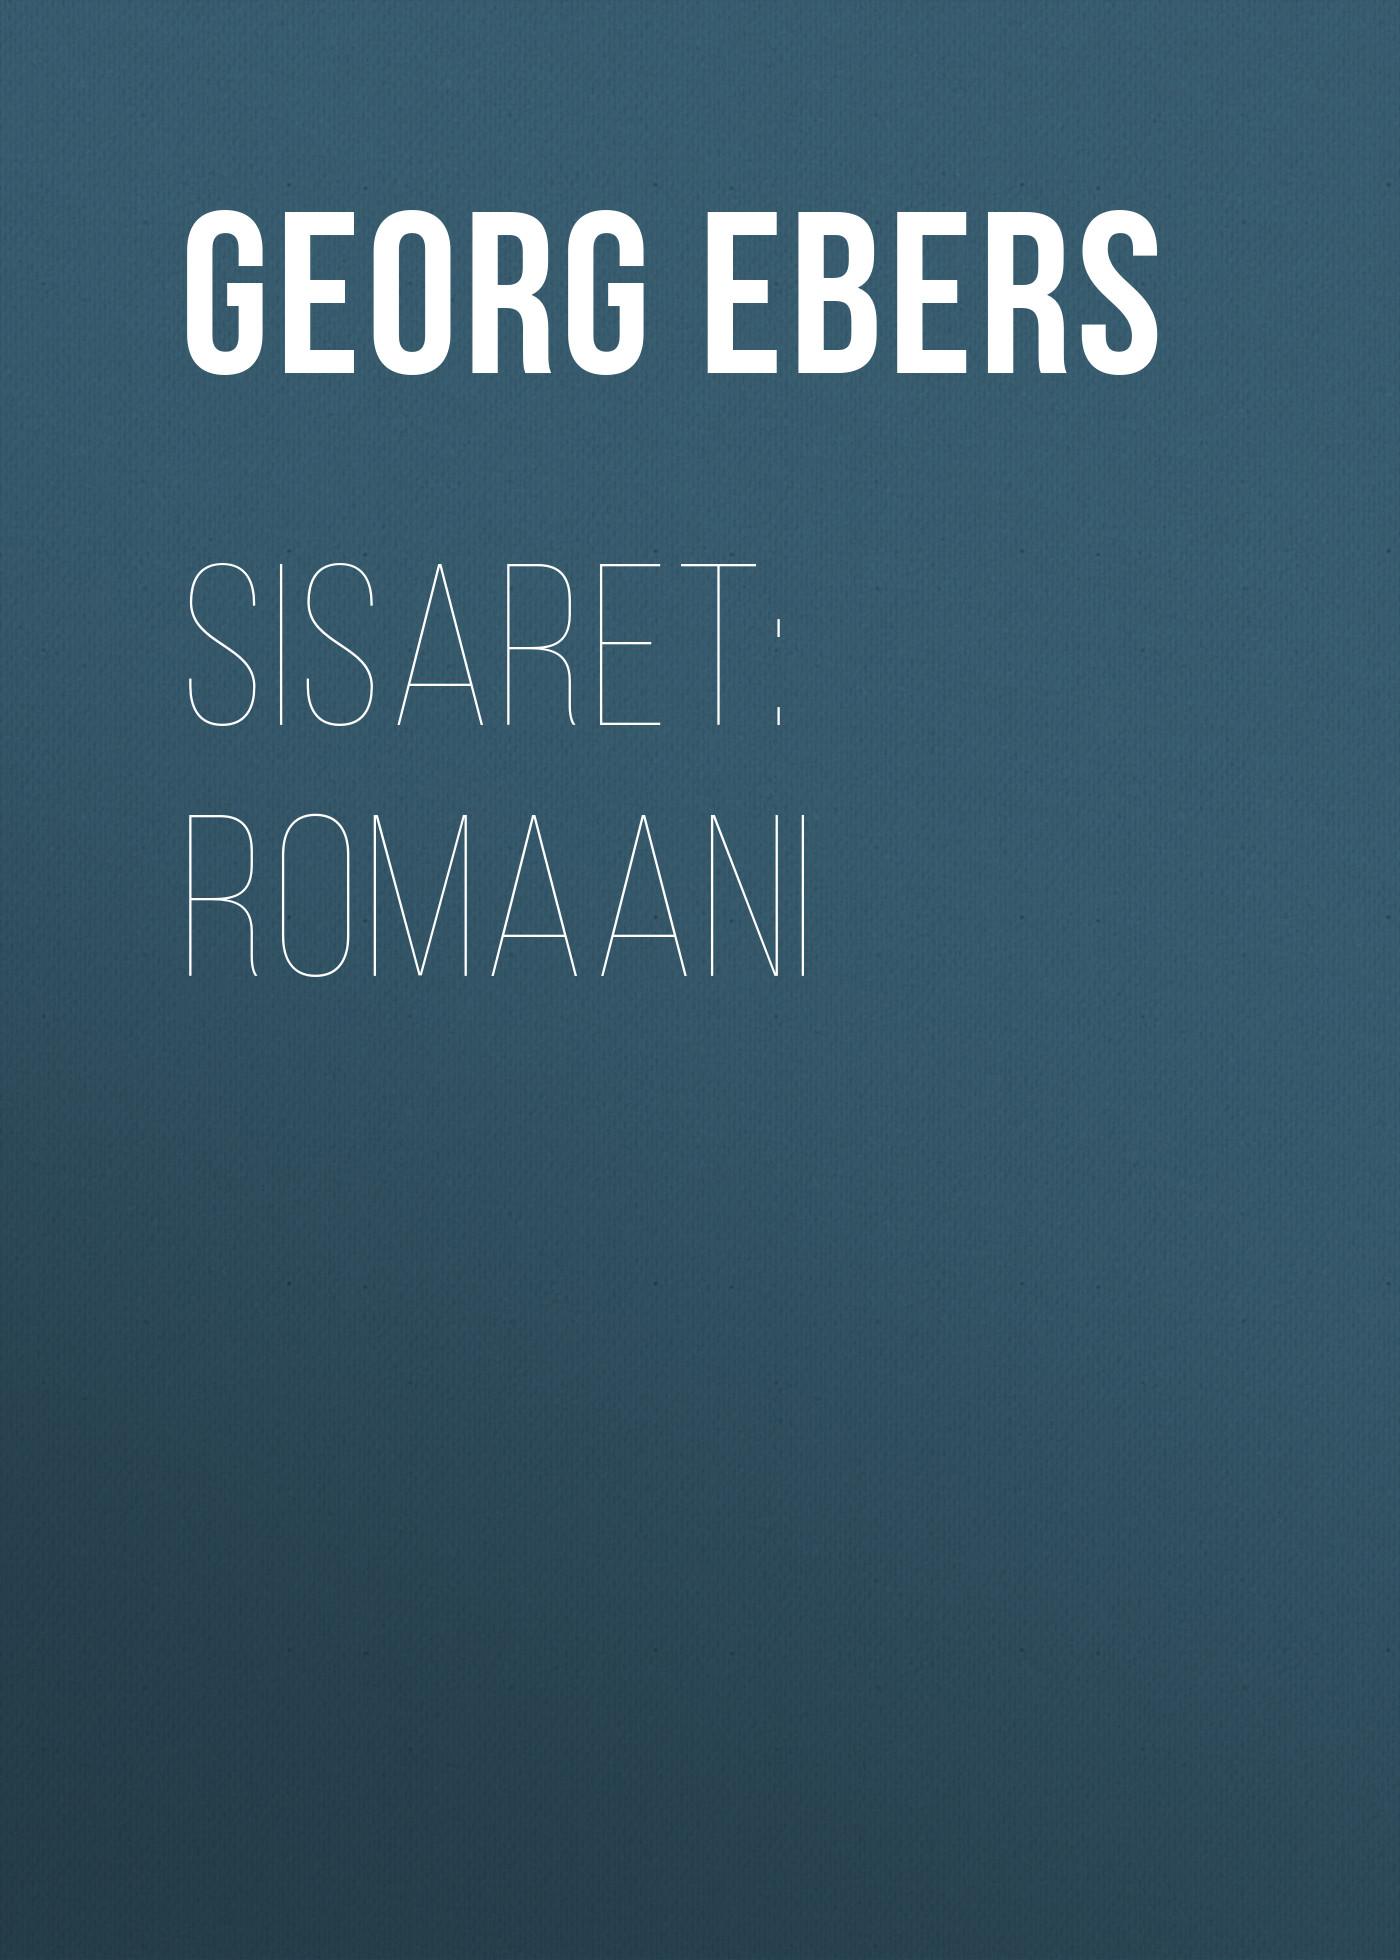 Georg Ebers Sisaret: Romaani georg ebers de nijlbruid